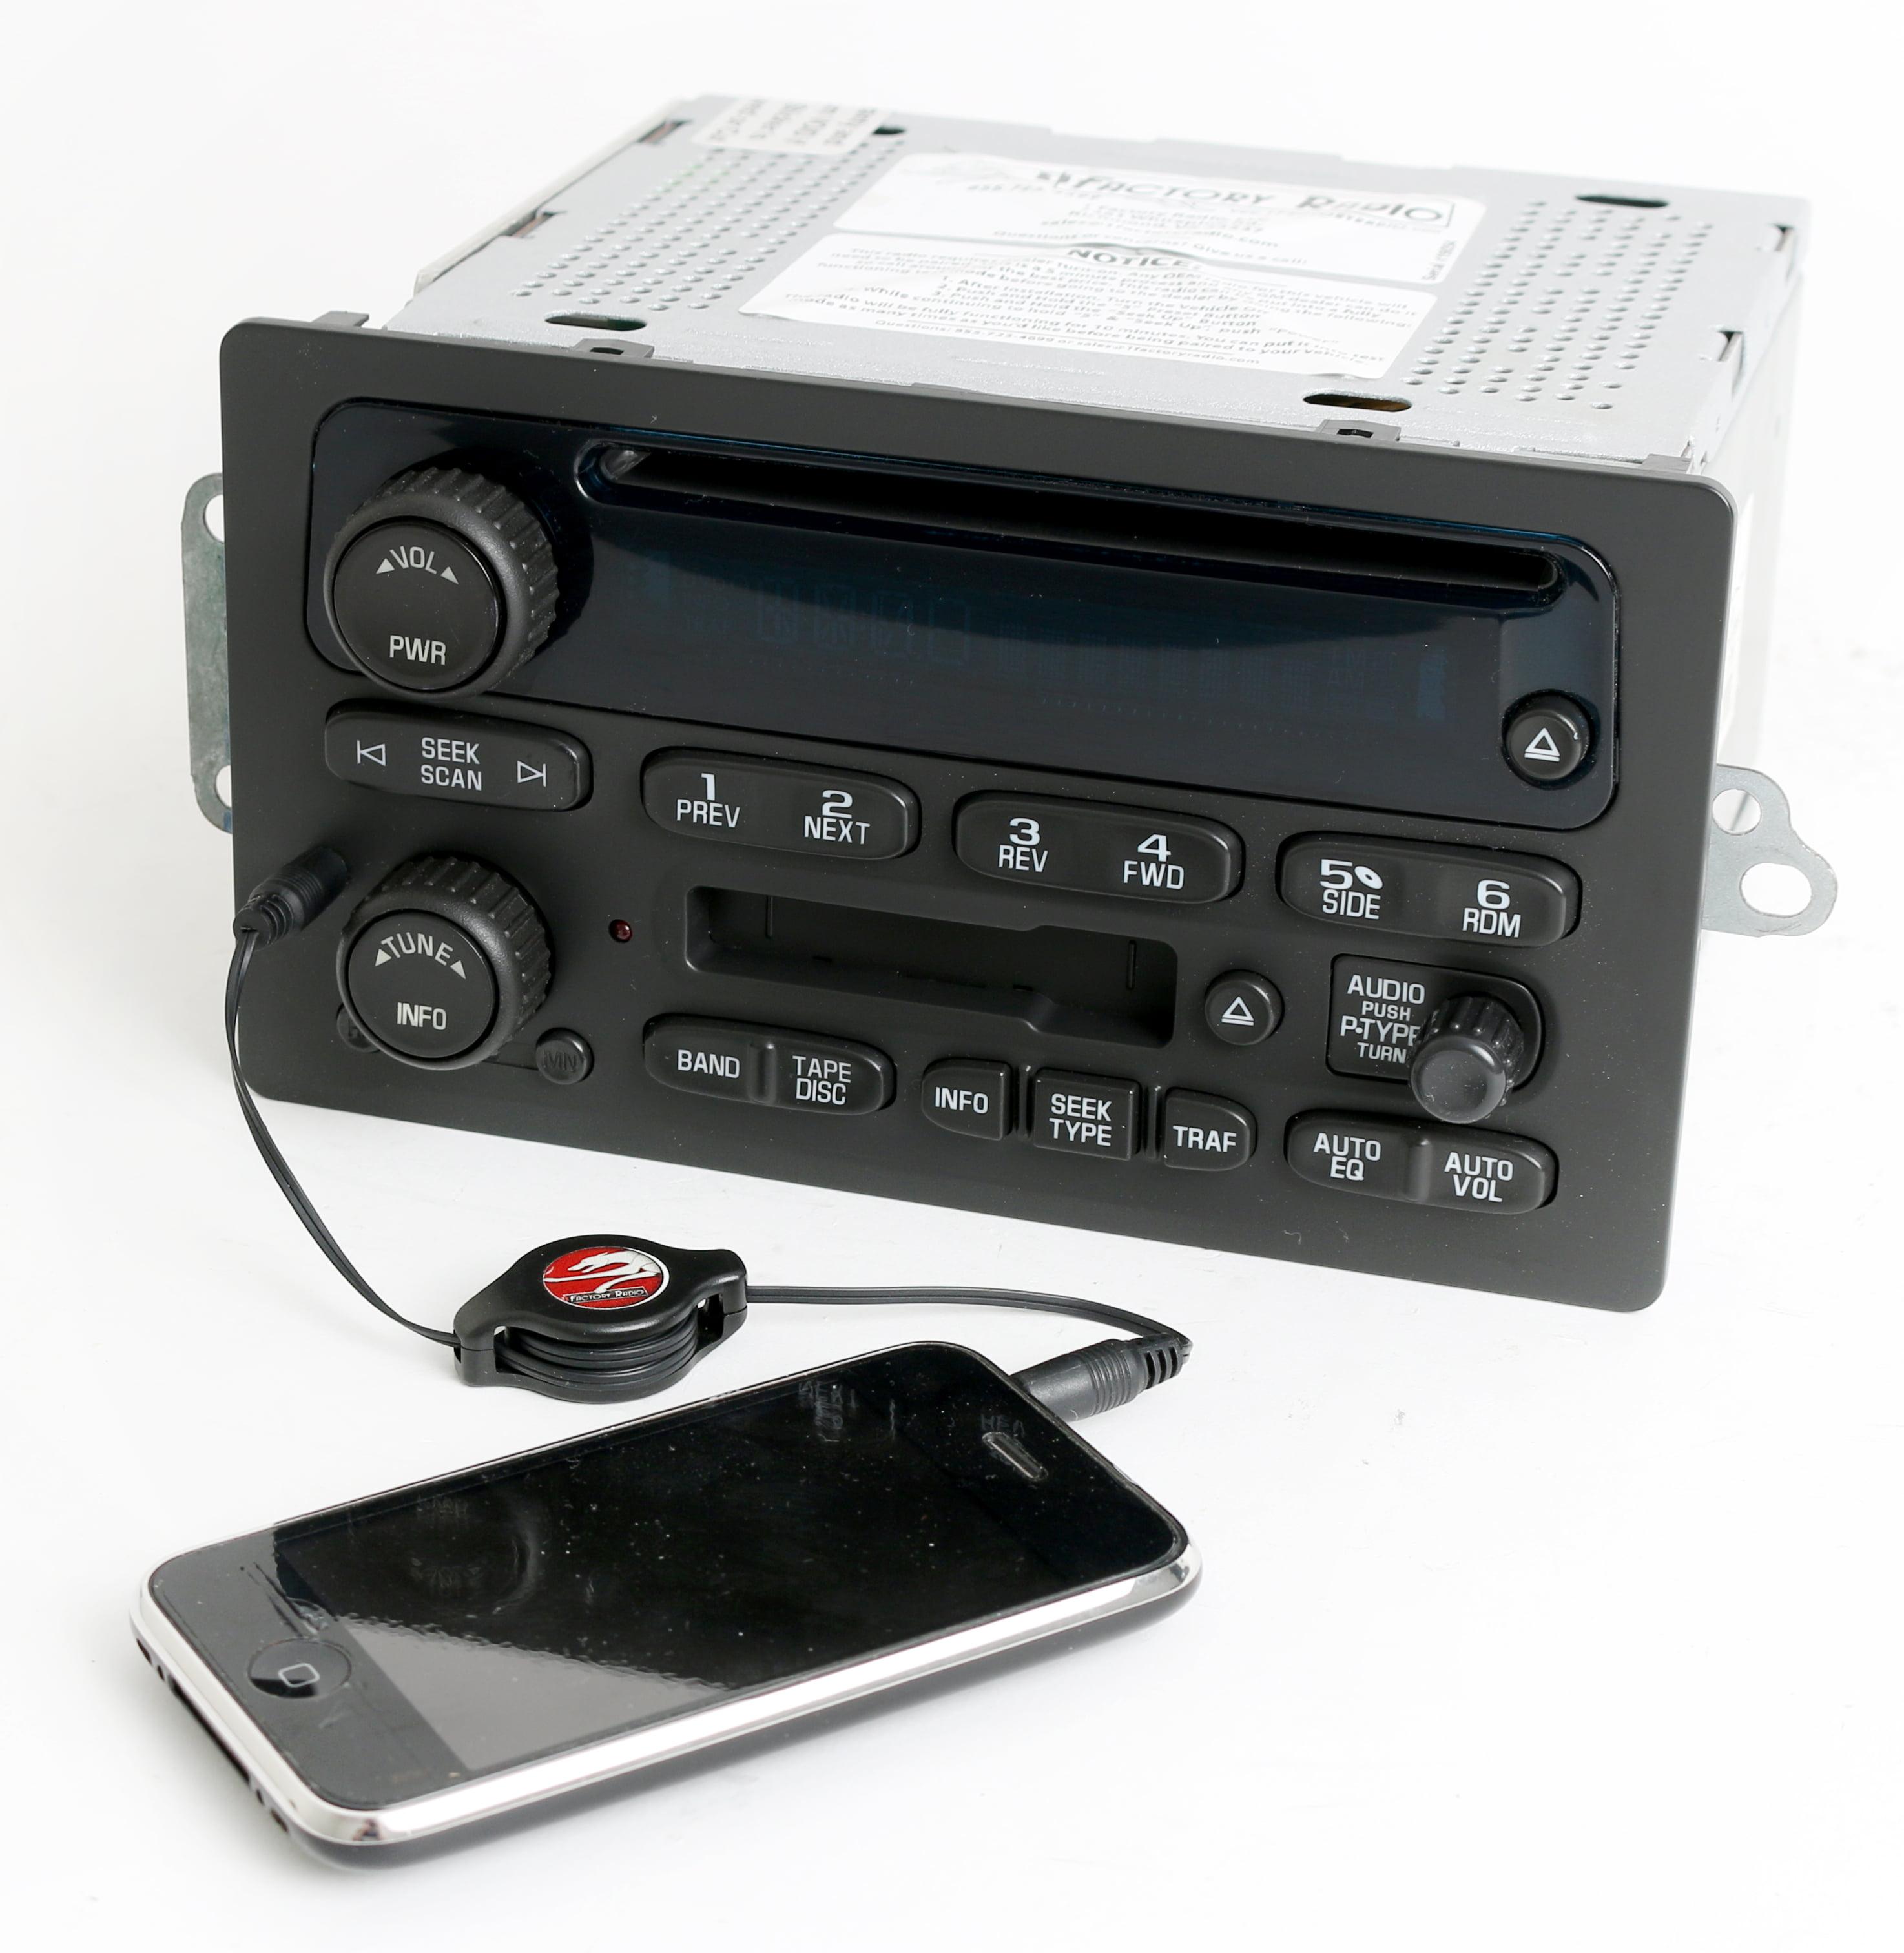 Chevy GMC 2003-2005 Truck Radio AM FM CD Player w Bluetooth Music Part 10357894